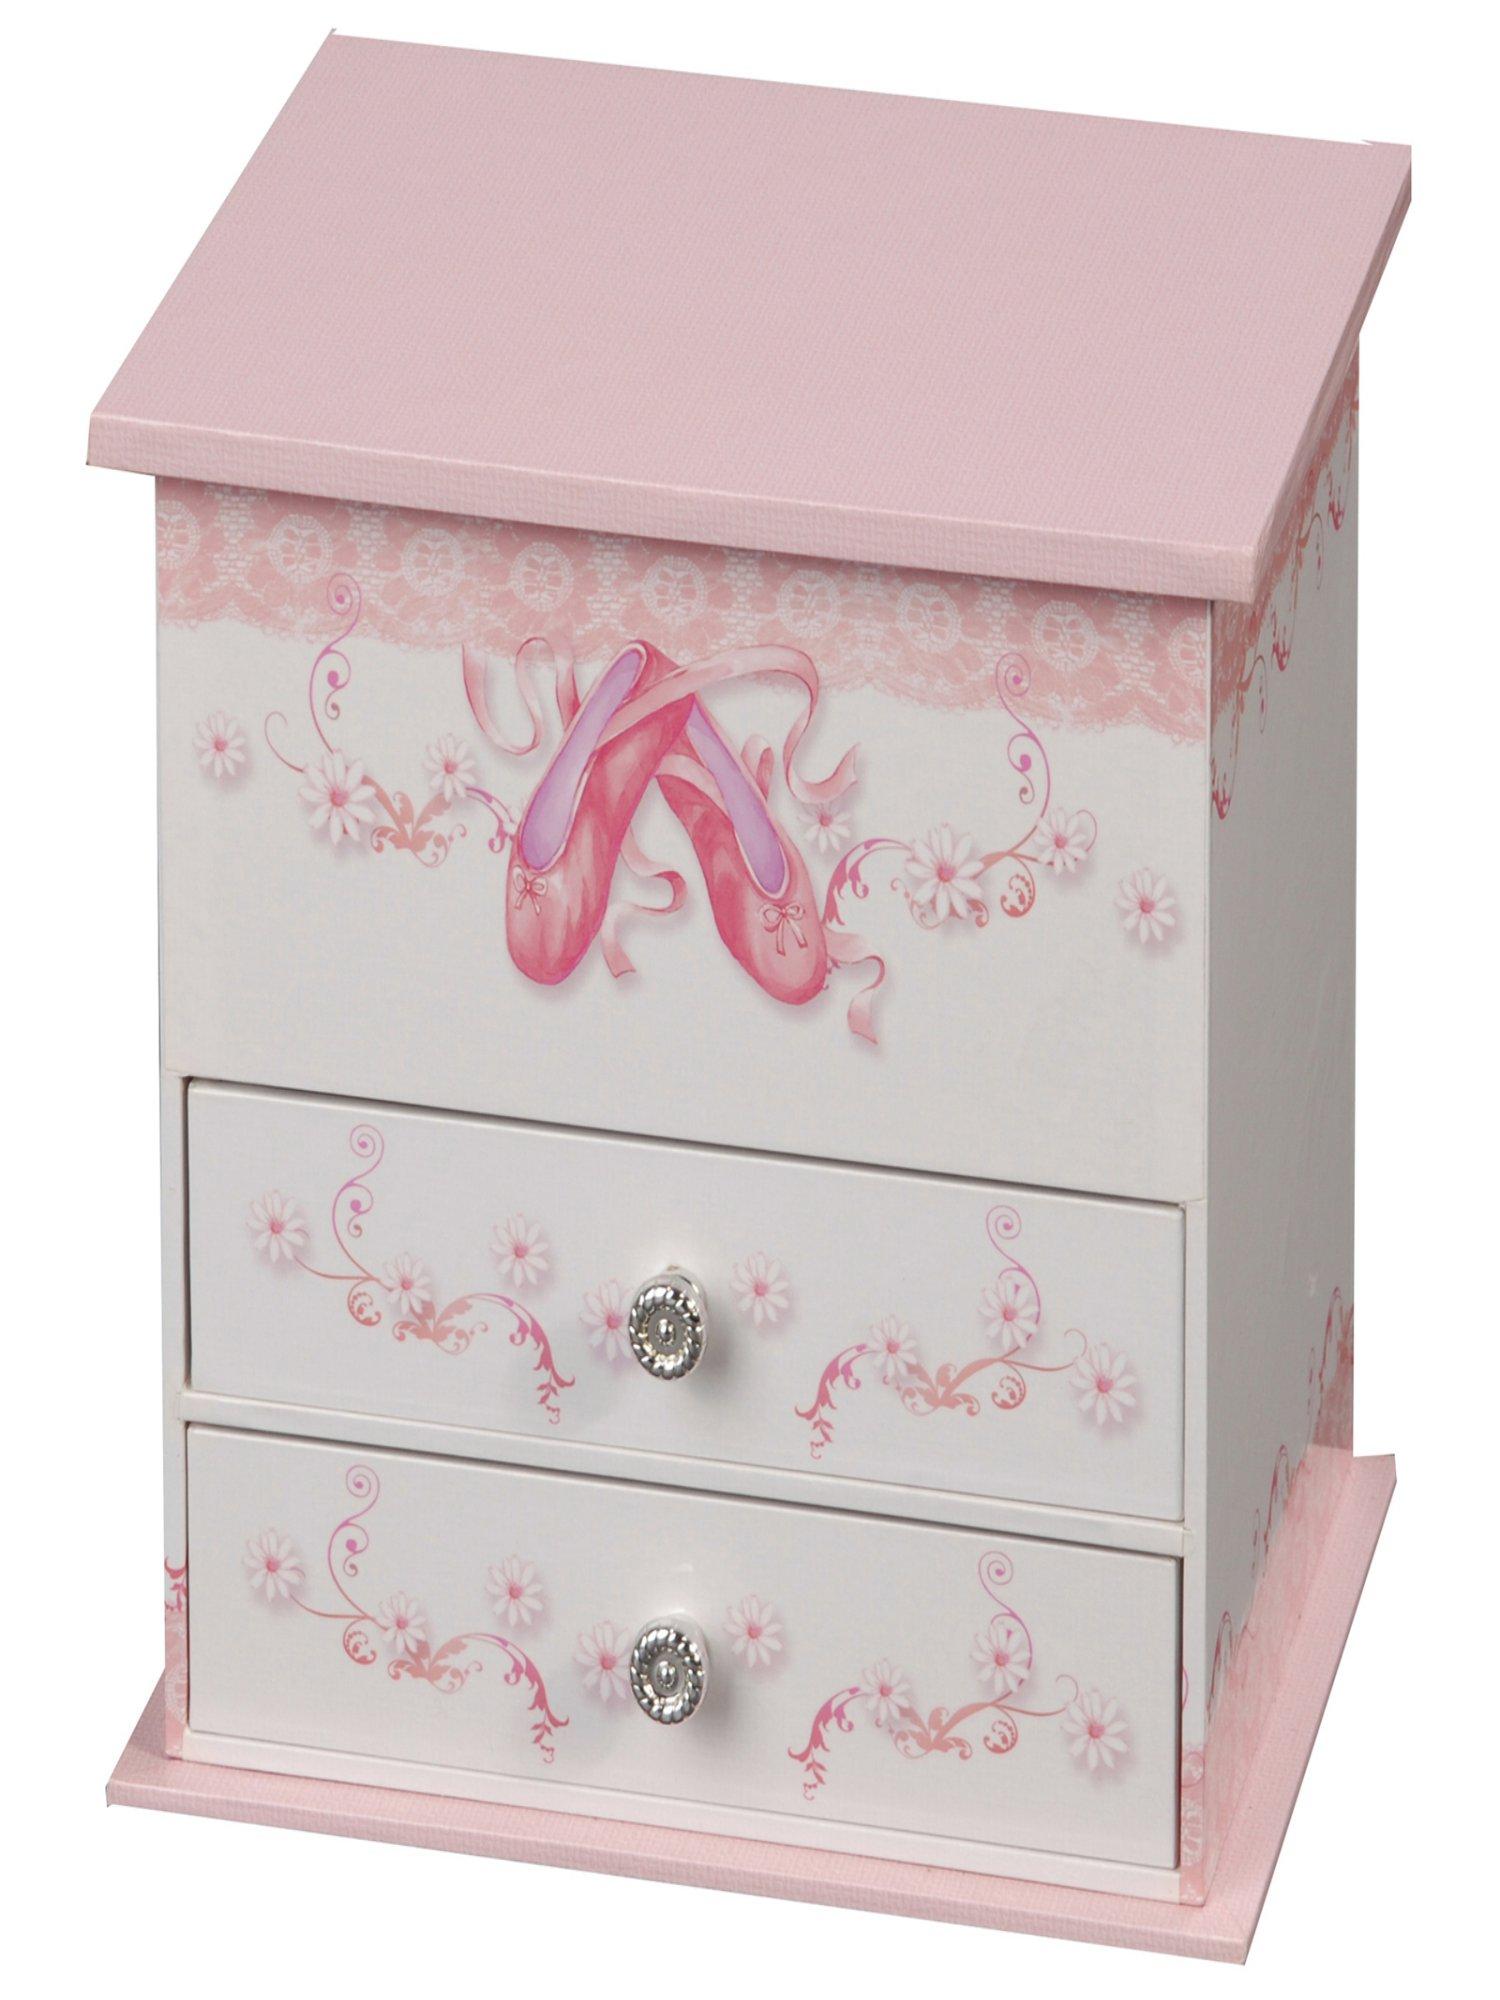 Mele & Co. Angel Musical Dancing Ballerina Jewelry Box - 7W x 6.3H in.